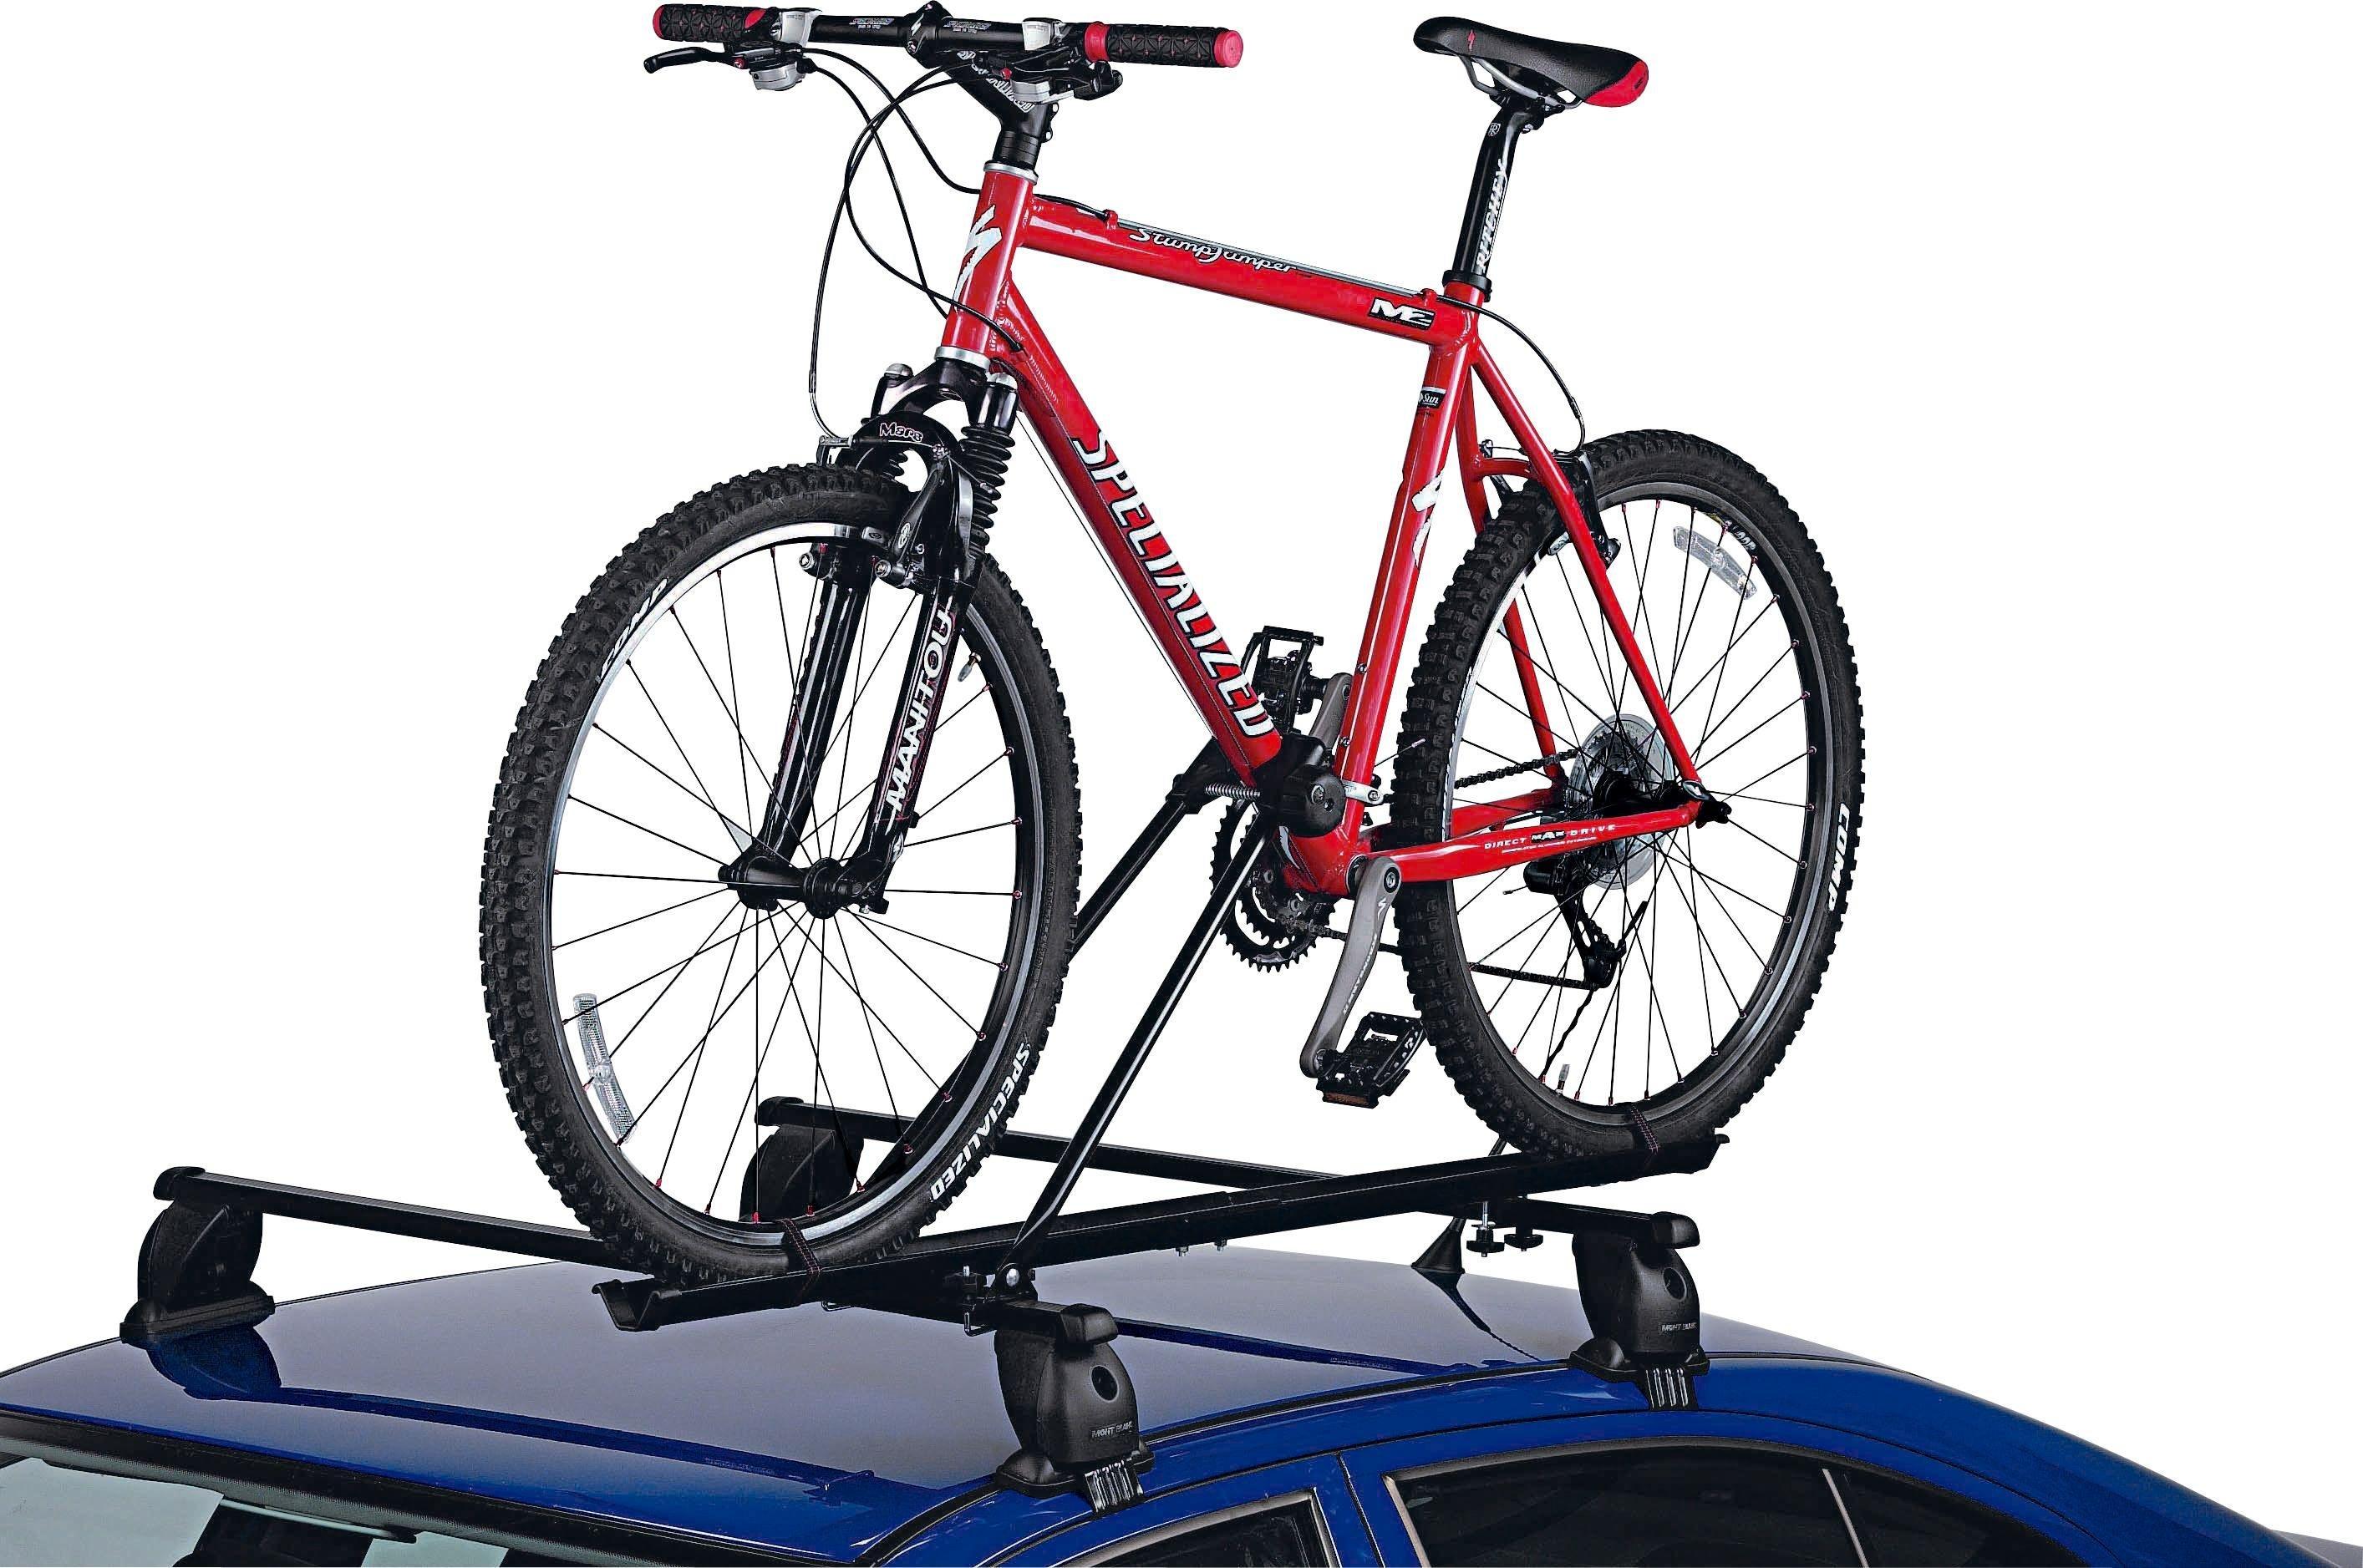 Peruzzo Raleigh Roofbar Bike Rack